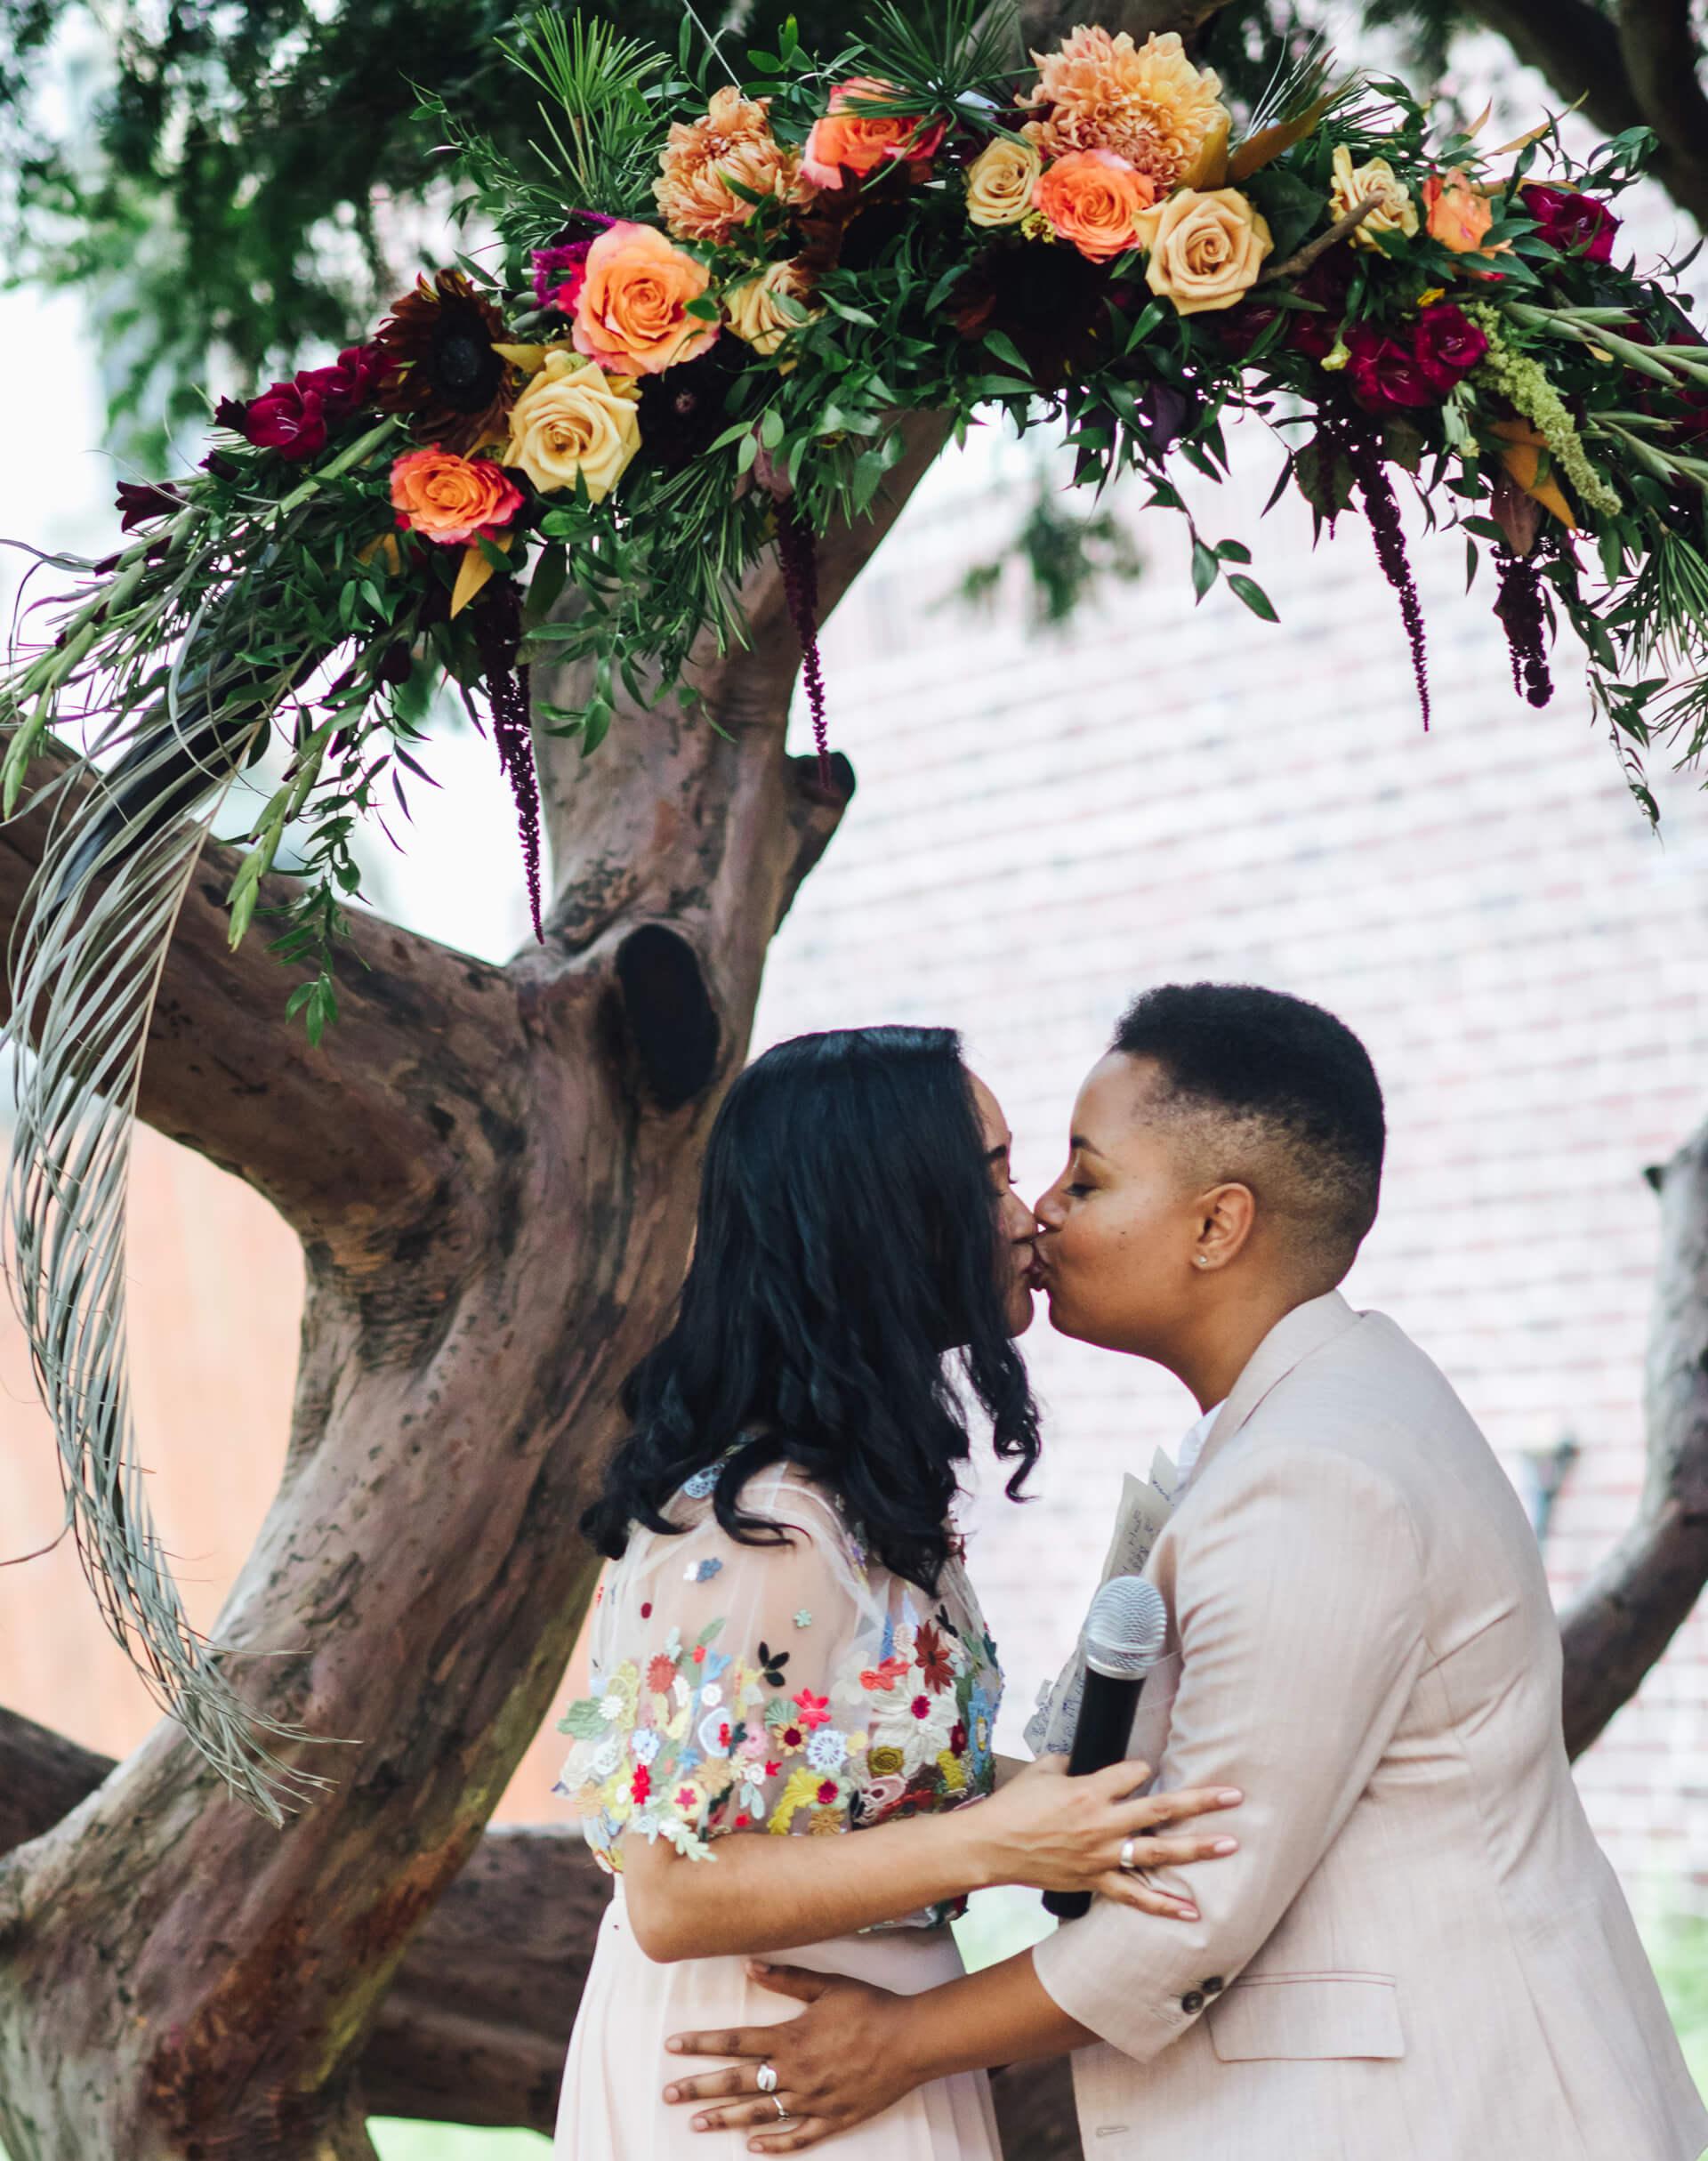 BROOKLYN SOCIETY FOR ETHICAL CULTURE - INTIMATE WEDDING - CHI-CHI ARI-298.jpg